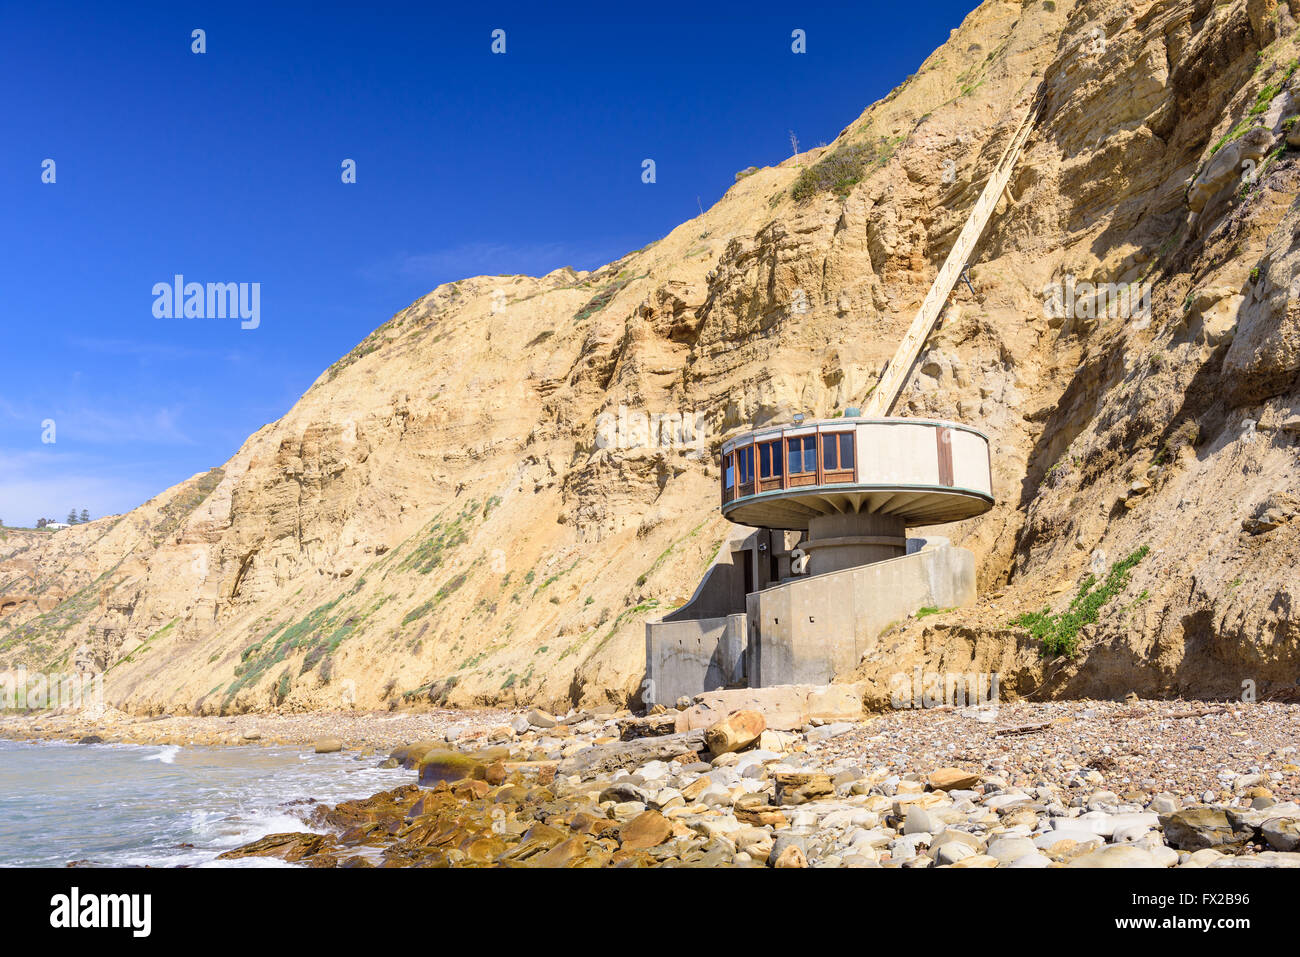 LA Jolla, California - 27 de febrero de 2016: La Casa de setas en Black's Beach. La casa data de 1968. Imagen De Stock